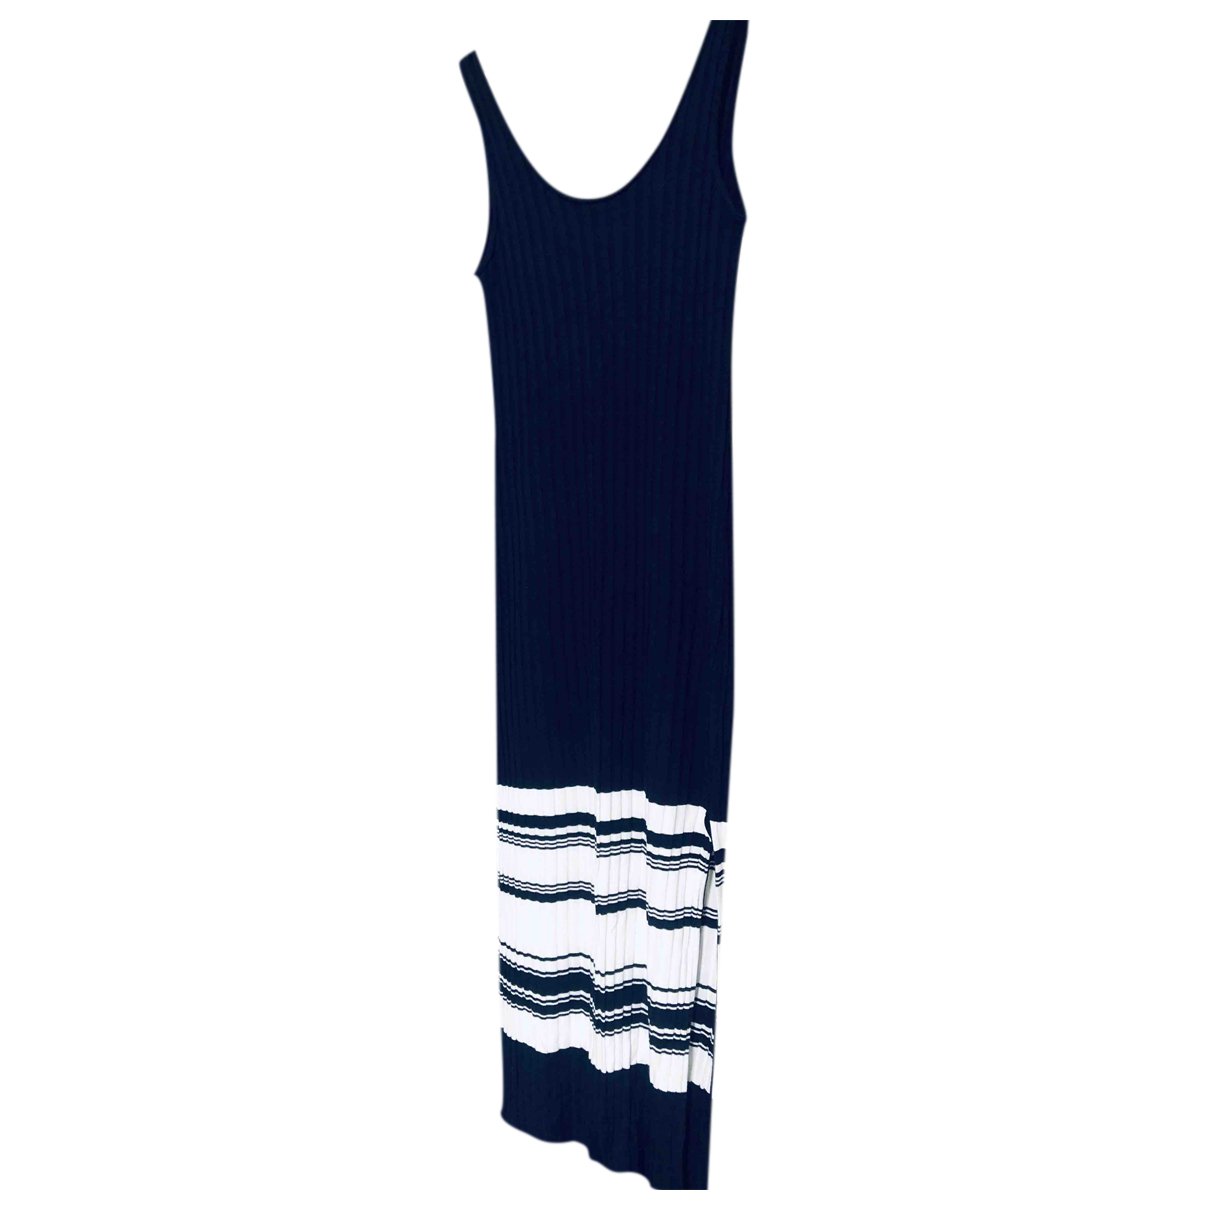 Massimo Dutti \N Kleid in  Bunt Baumwolle